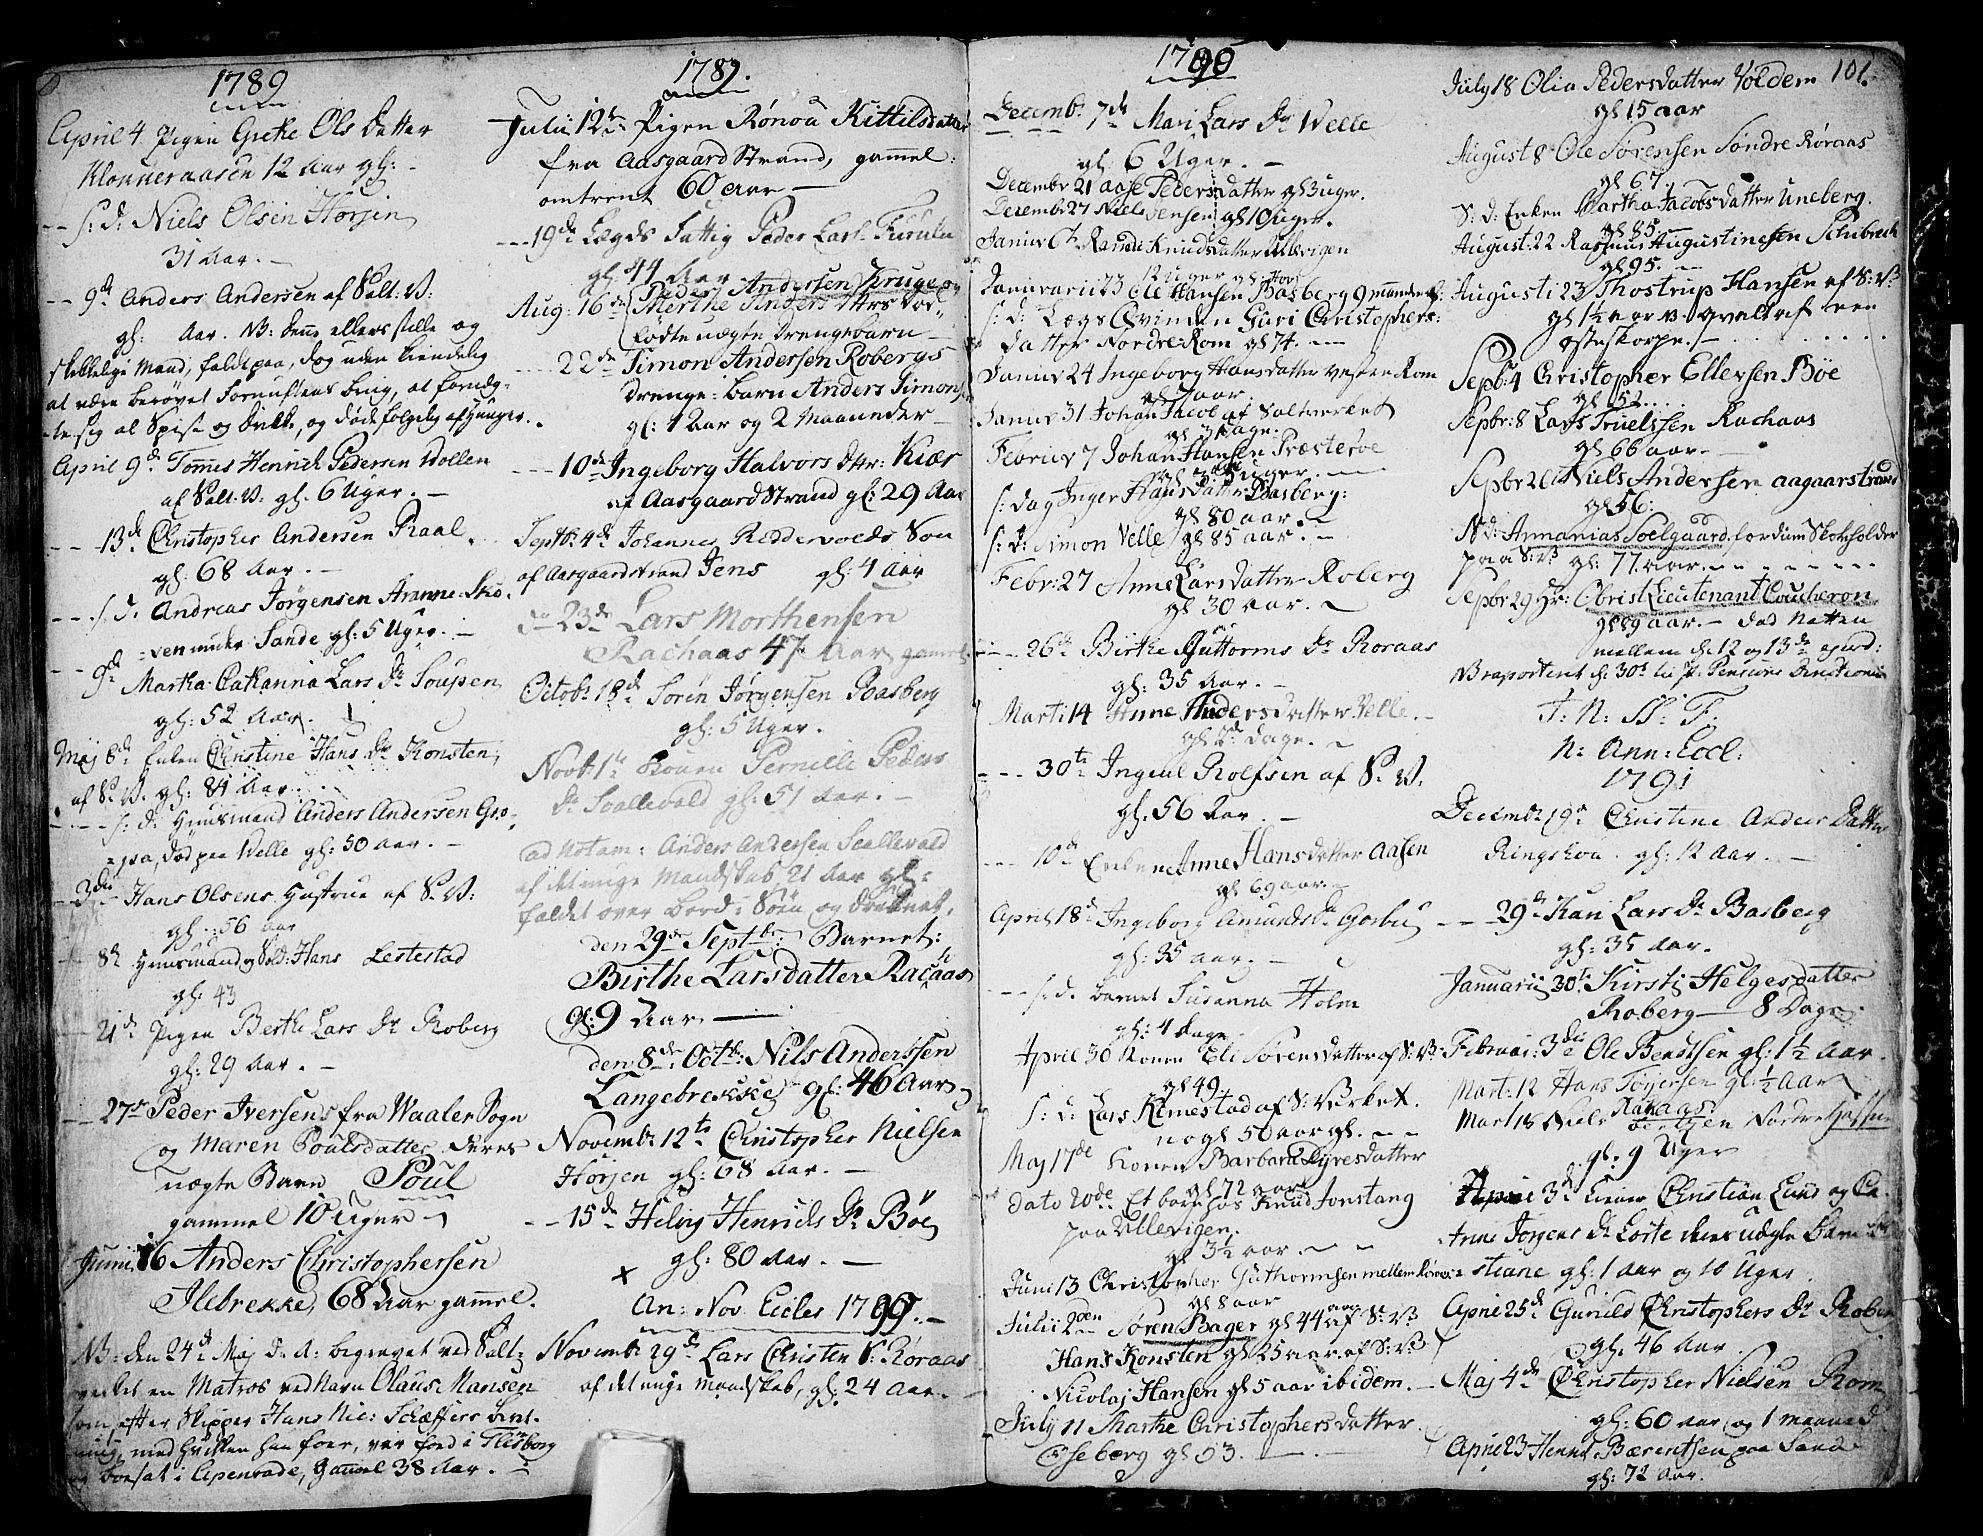 SAKO, Sem kirkebøker, F/Fb/L0002: Ministerialbok nr. II 2, 1764-1792, s. 101